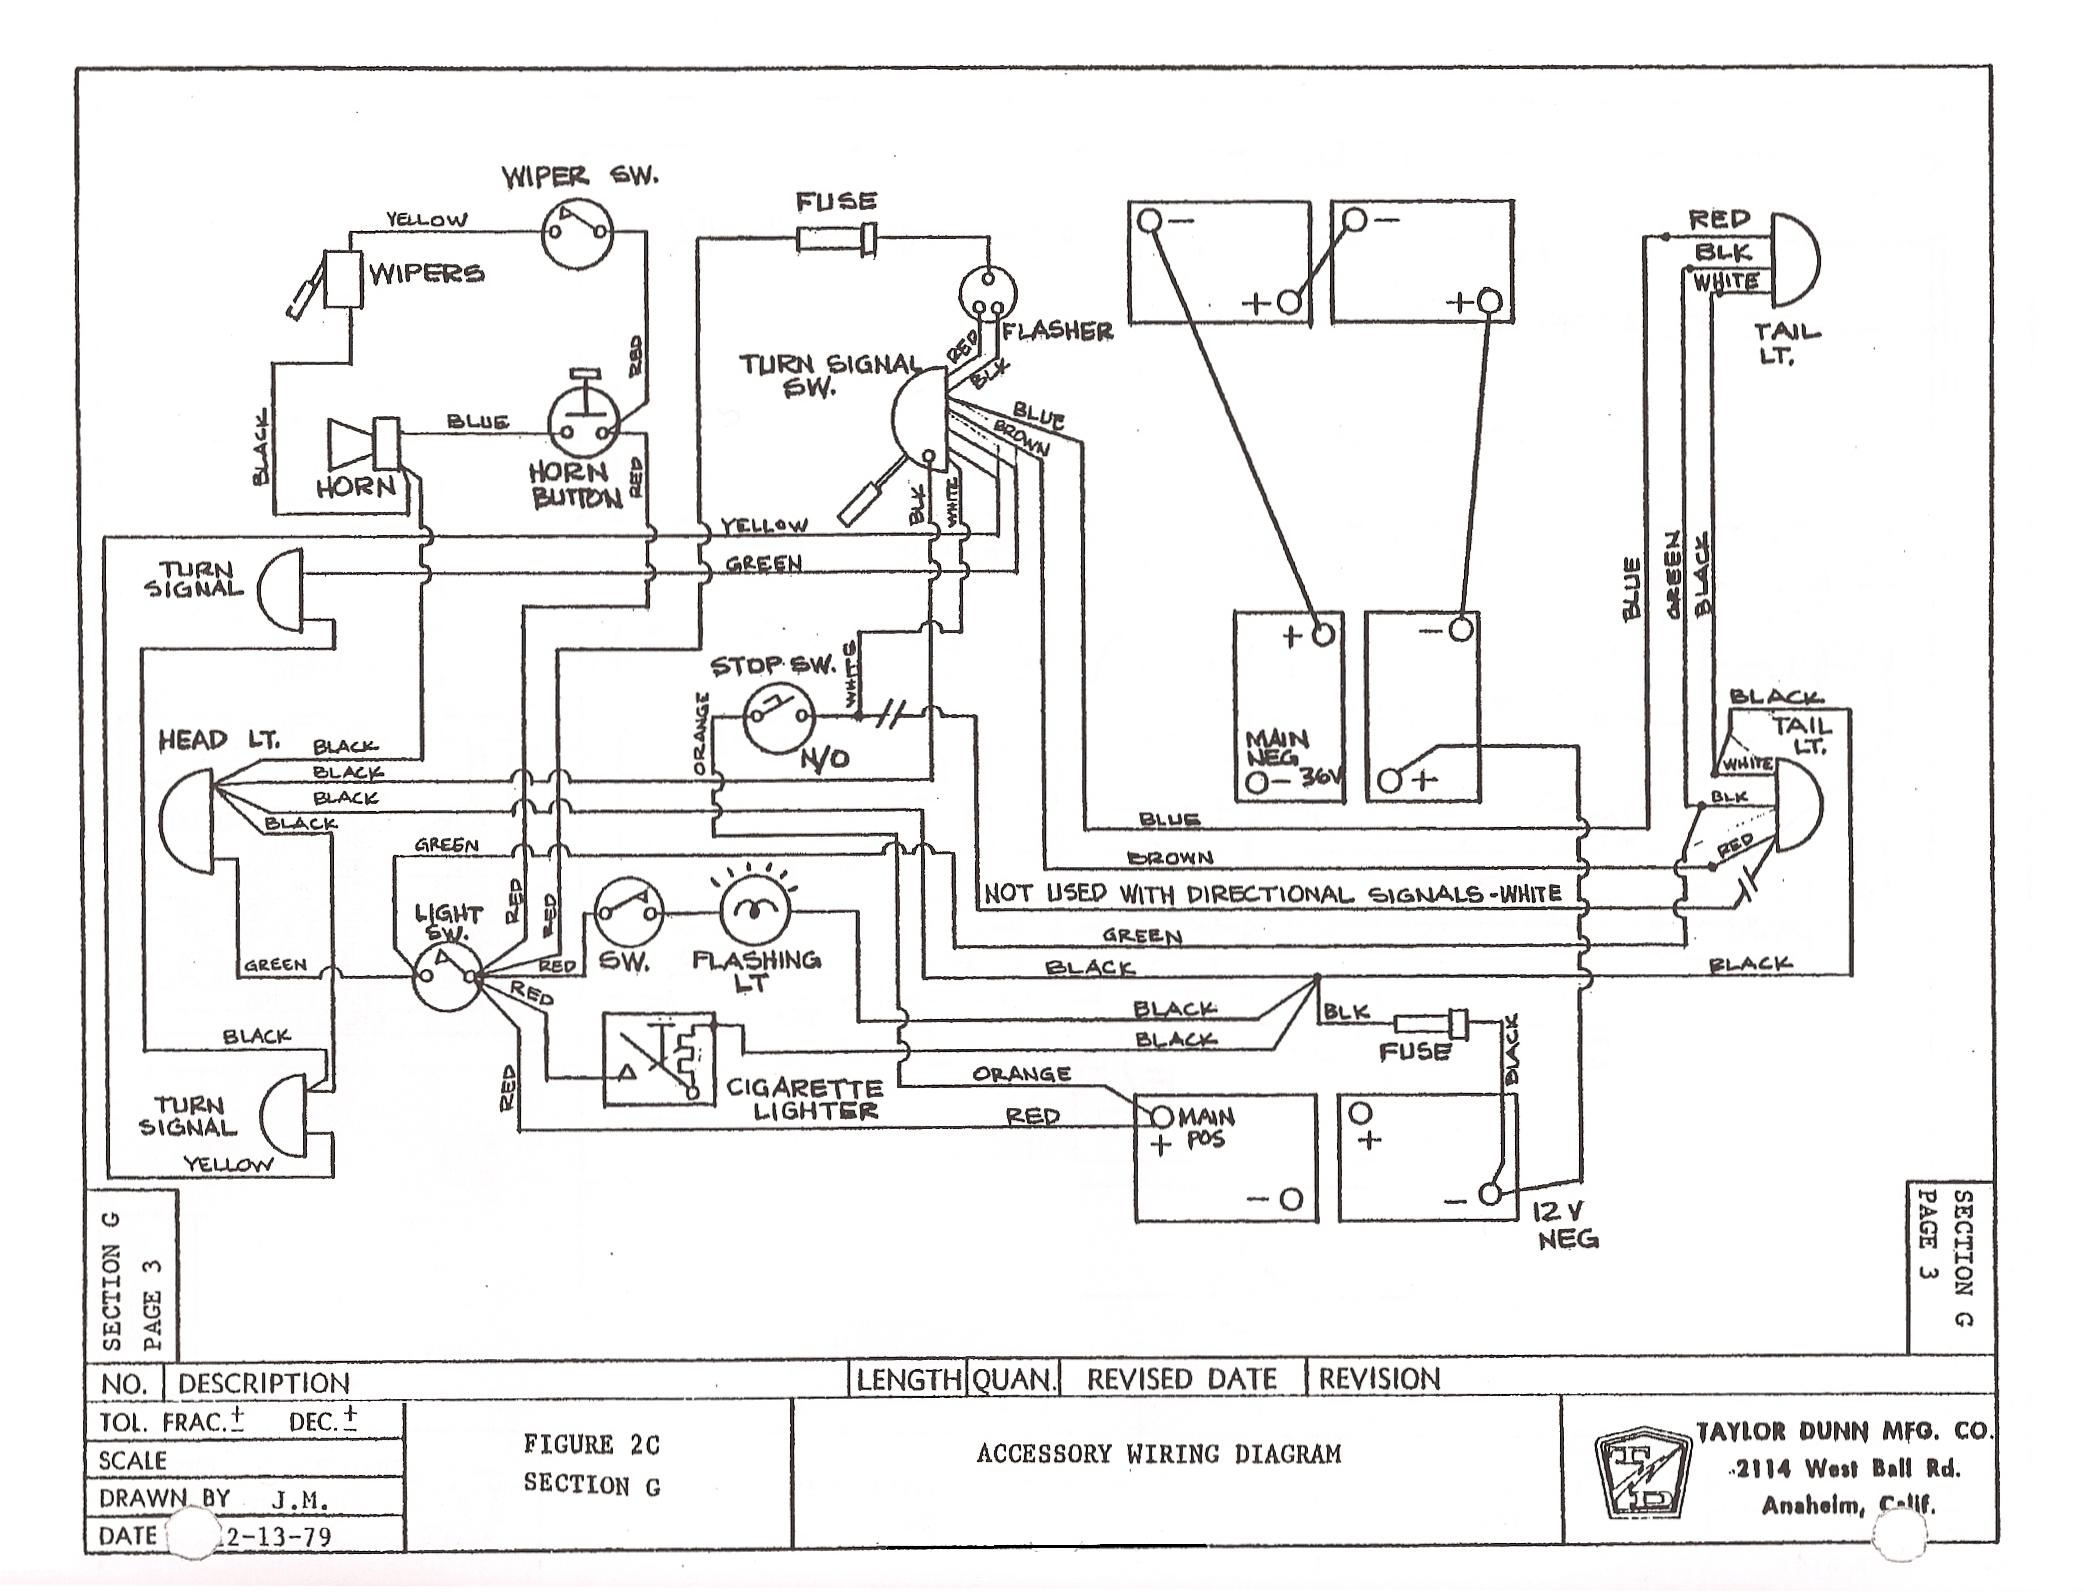 1989 Ezgo Marathon Wiring Diagram Resistor | Wiring Diagram - Ezgo Marathon Wiring Diagram